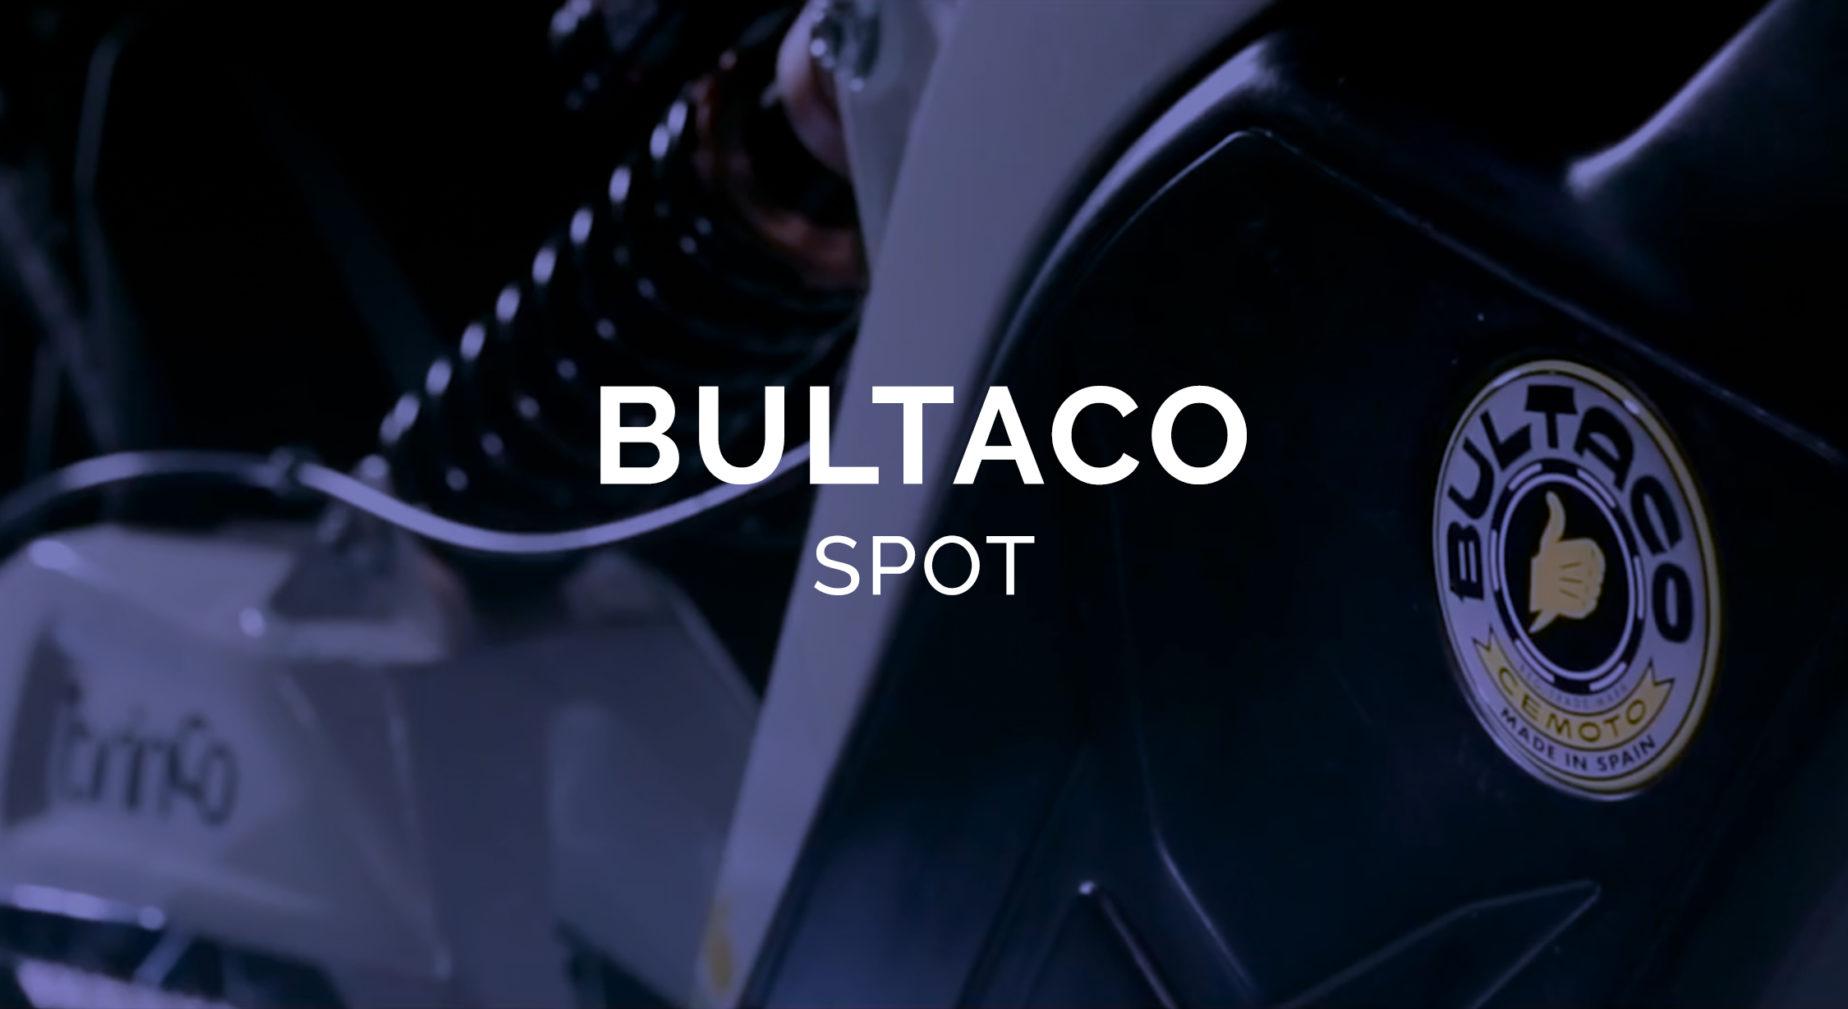 Bultaco SPOT